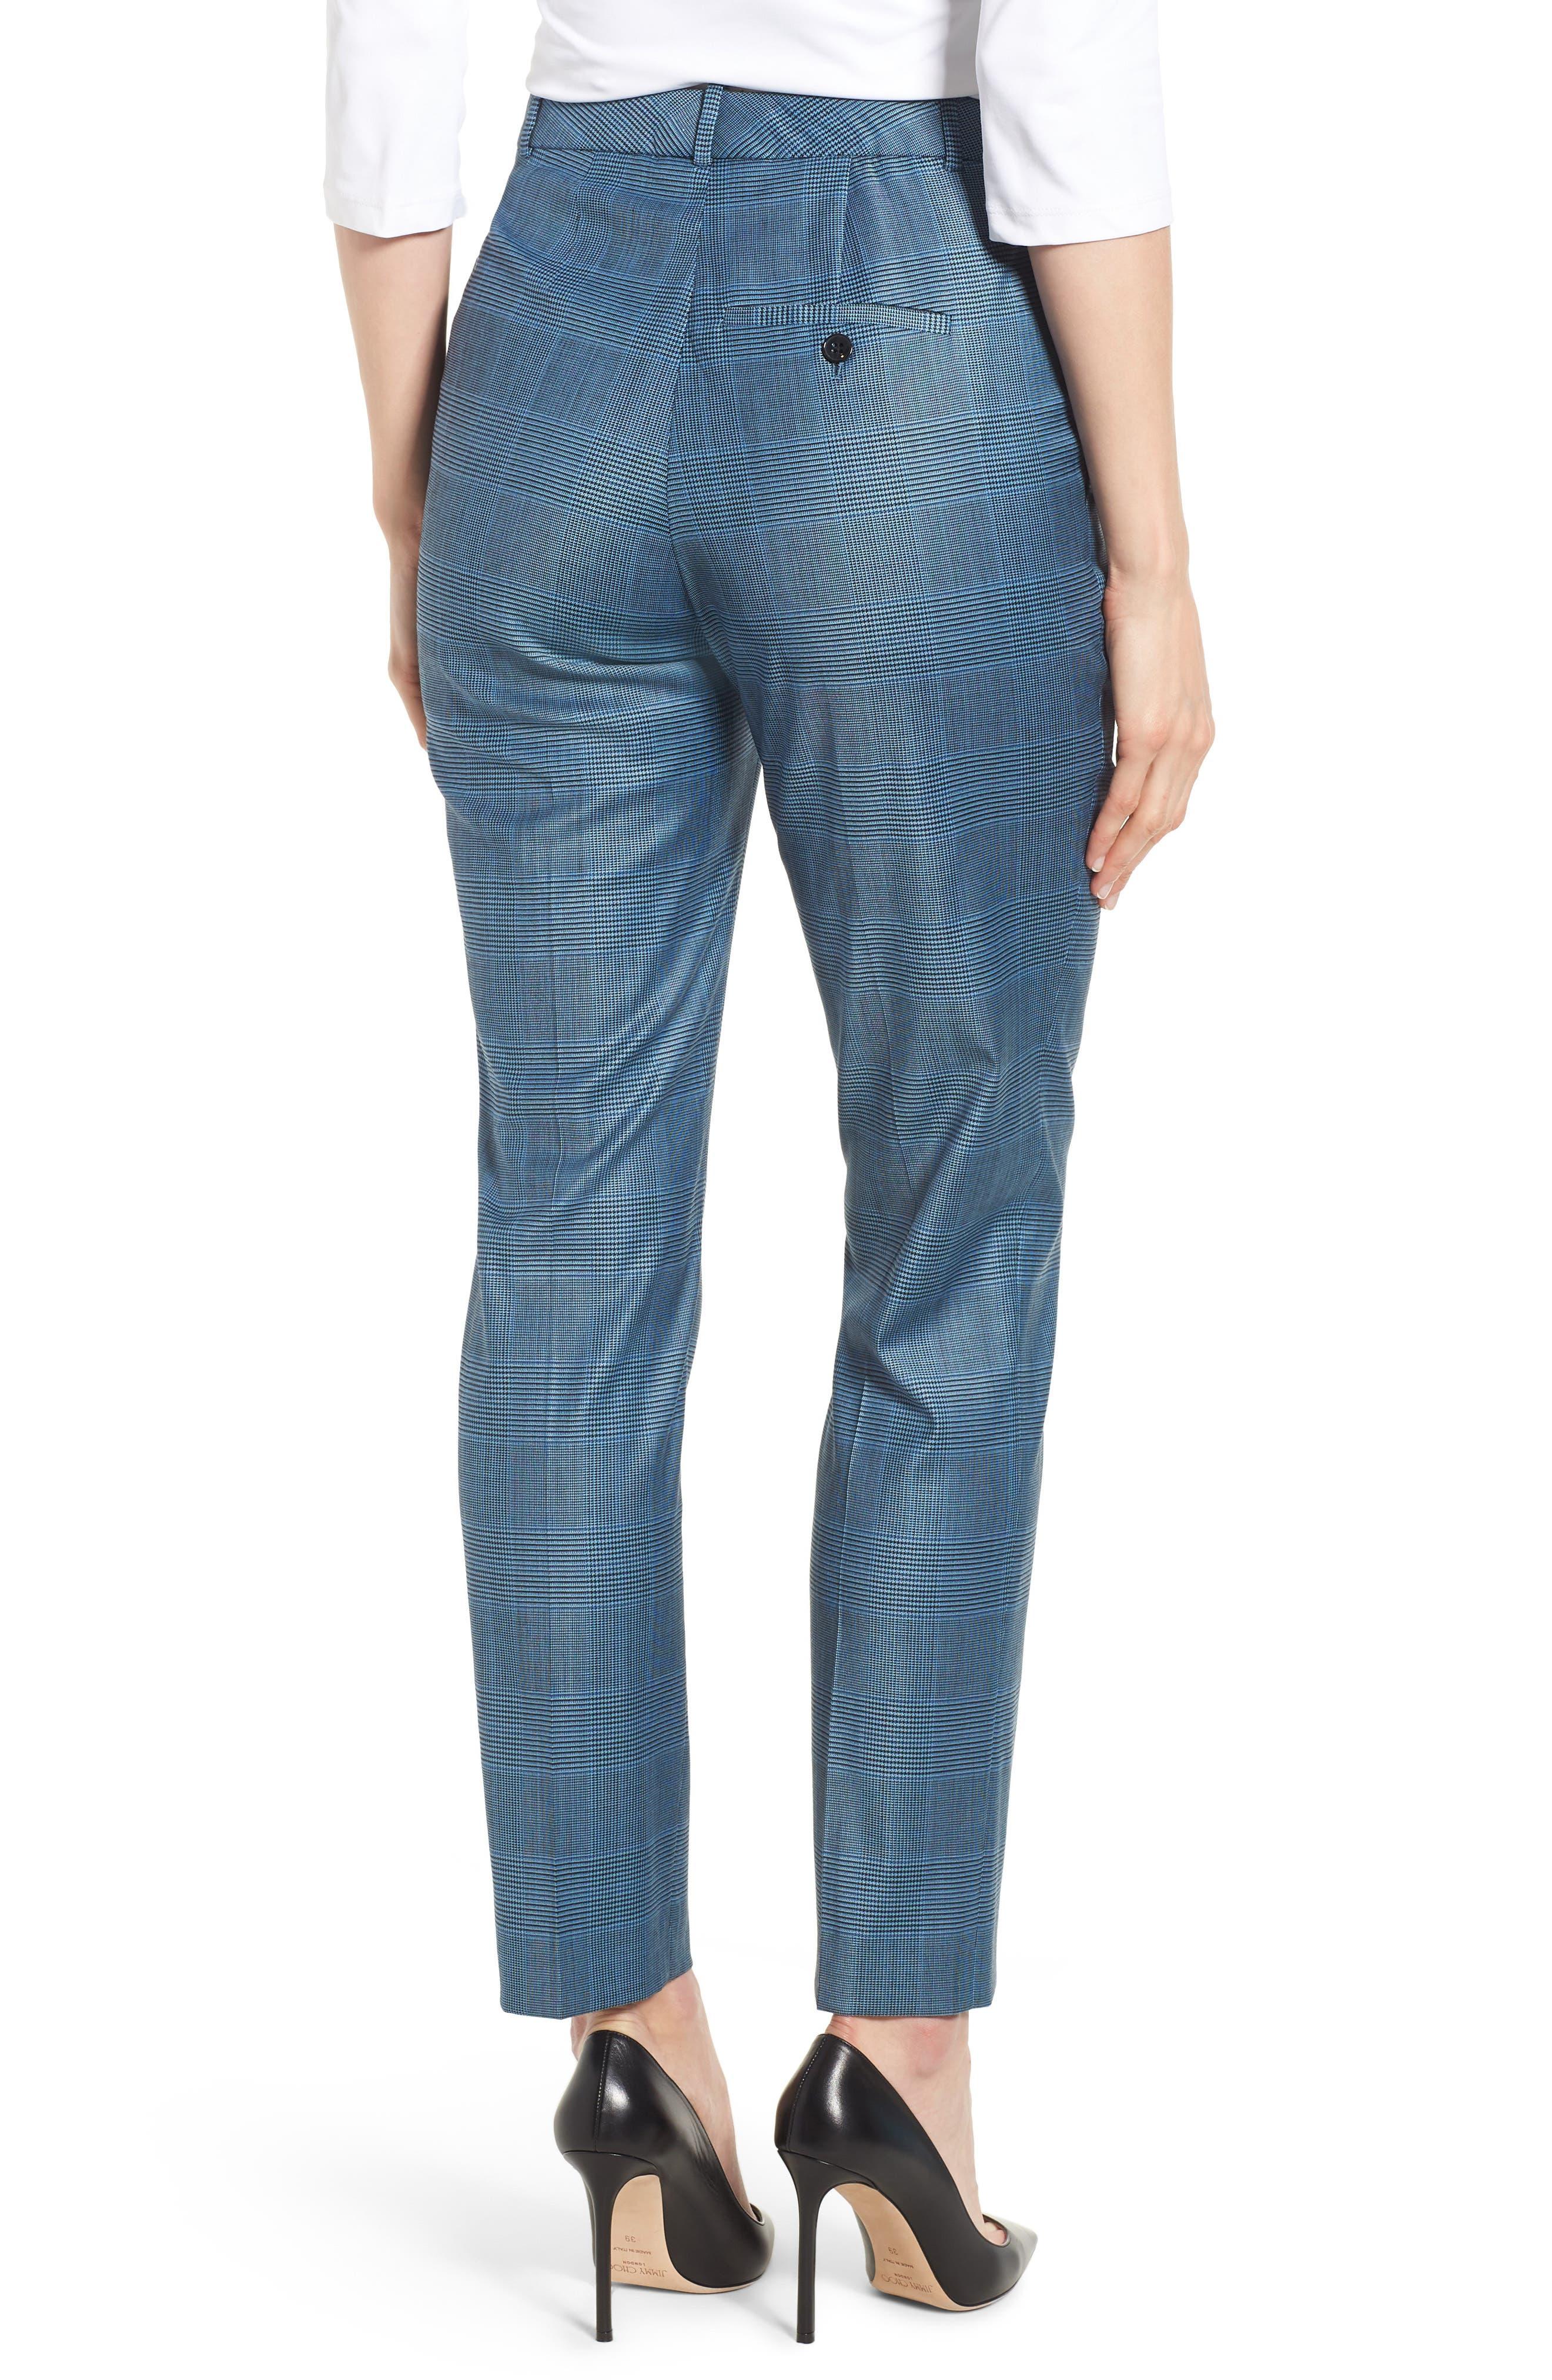 Tofilia Glencheck Slim Fit Trousers,                             Alternate thumbnail 2, color,                             Sailor Blue Fantasy